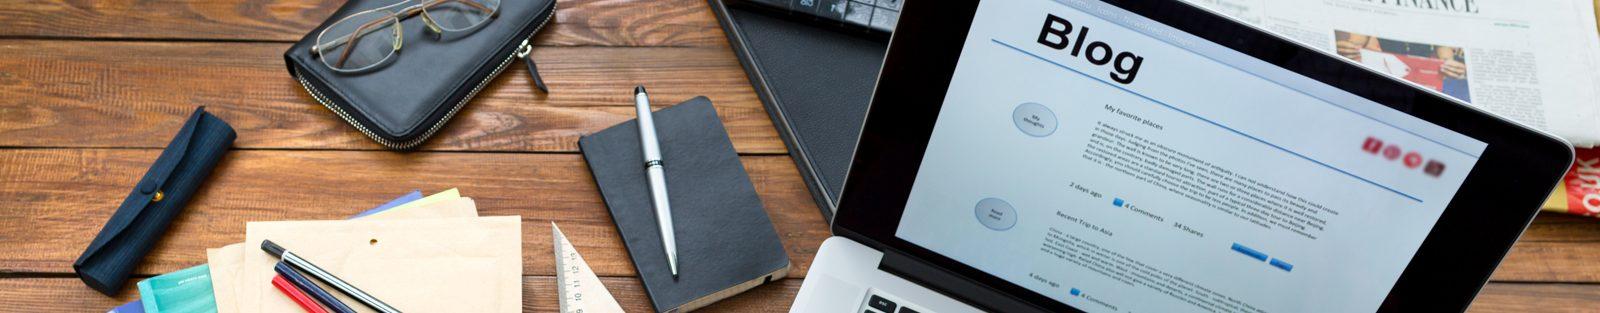 Blog SPNews – Tecnologia nas Micro-Empresas